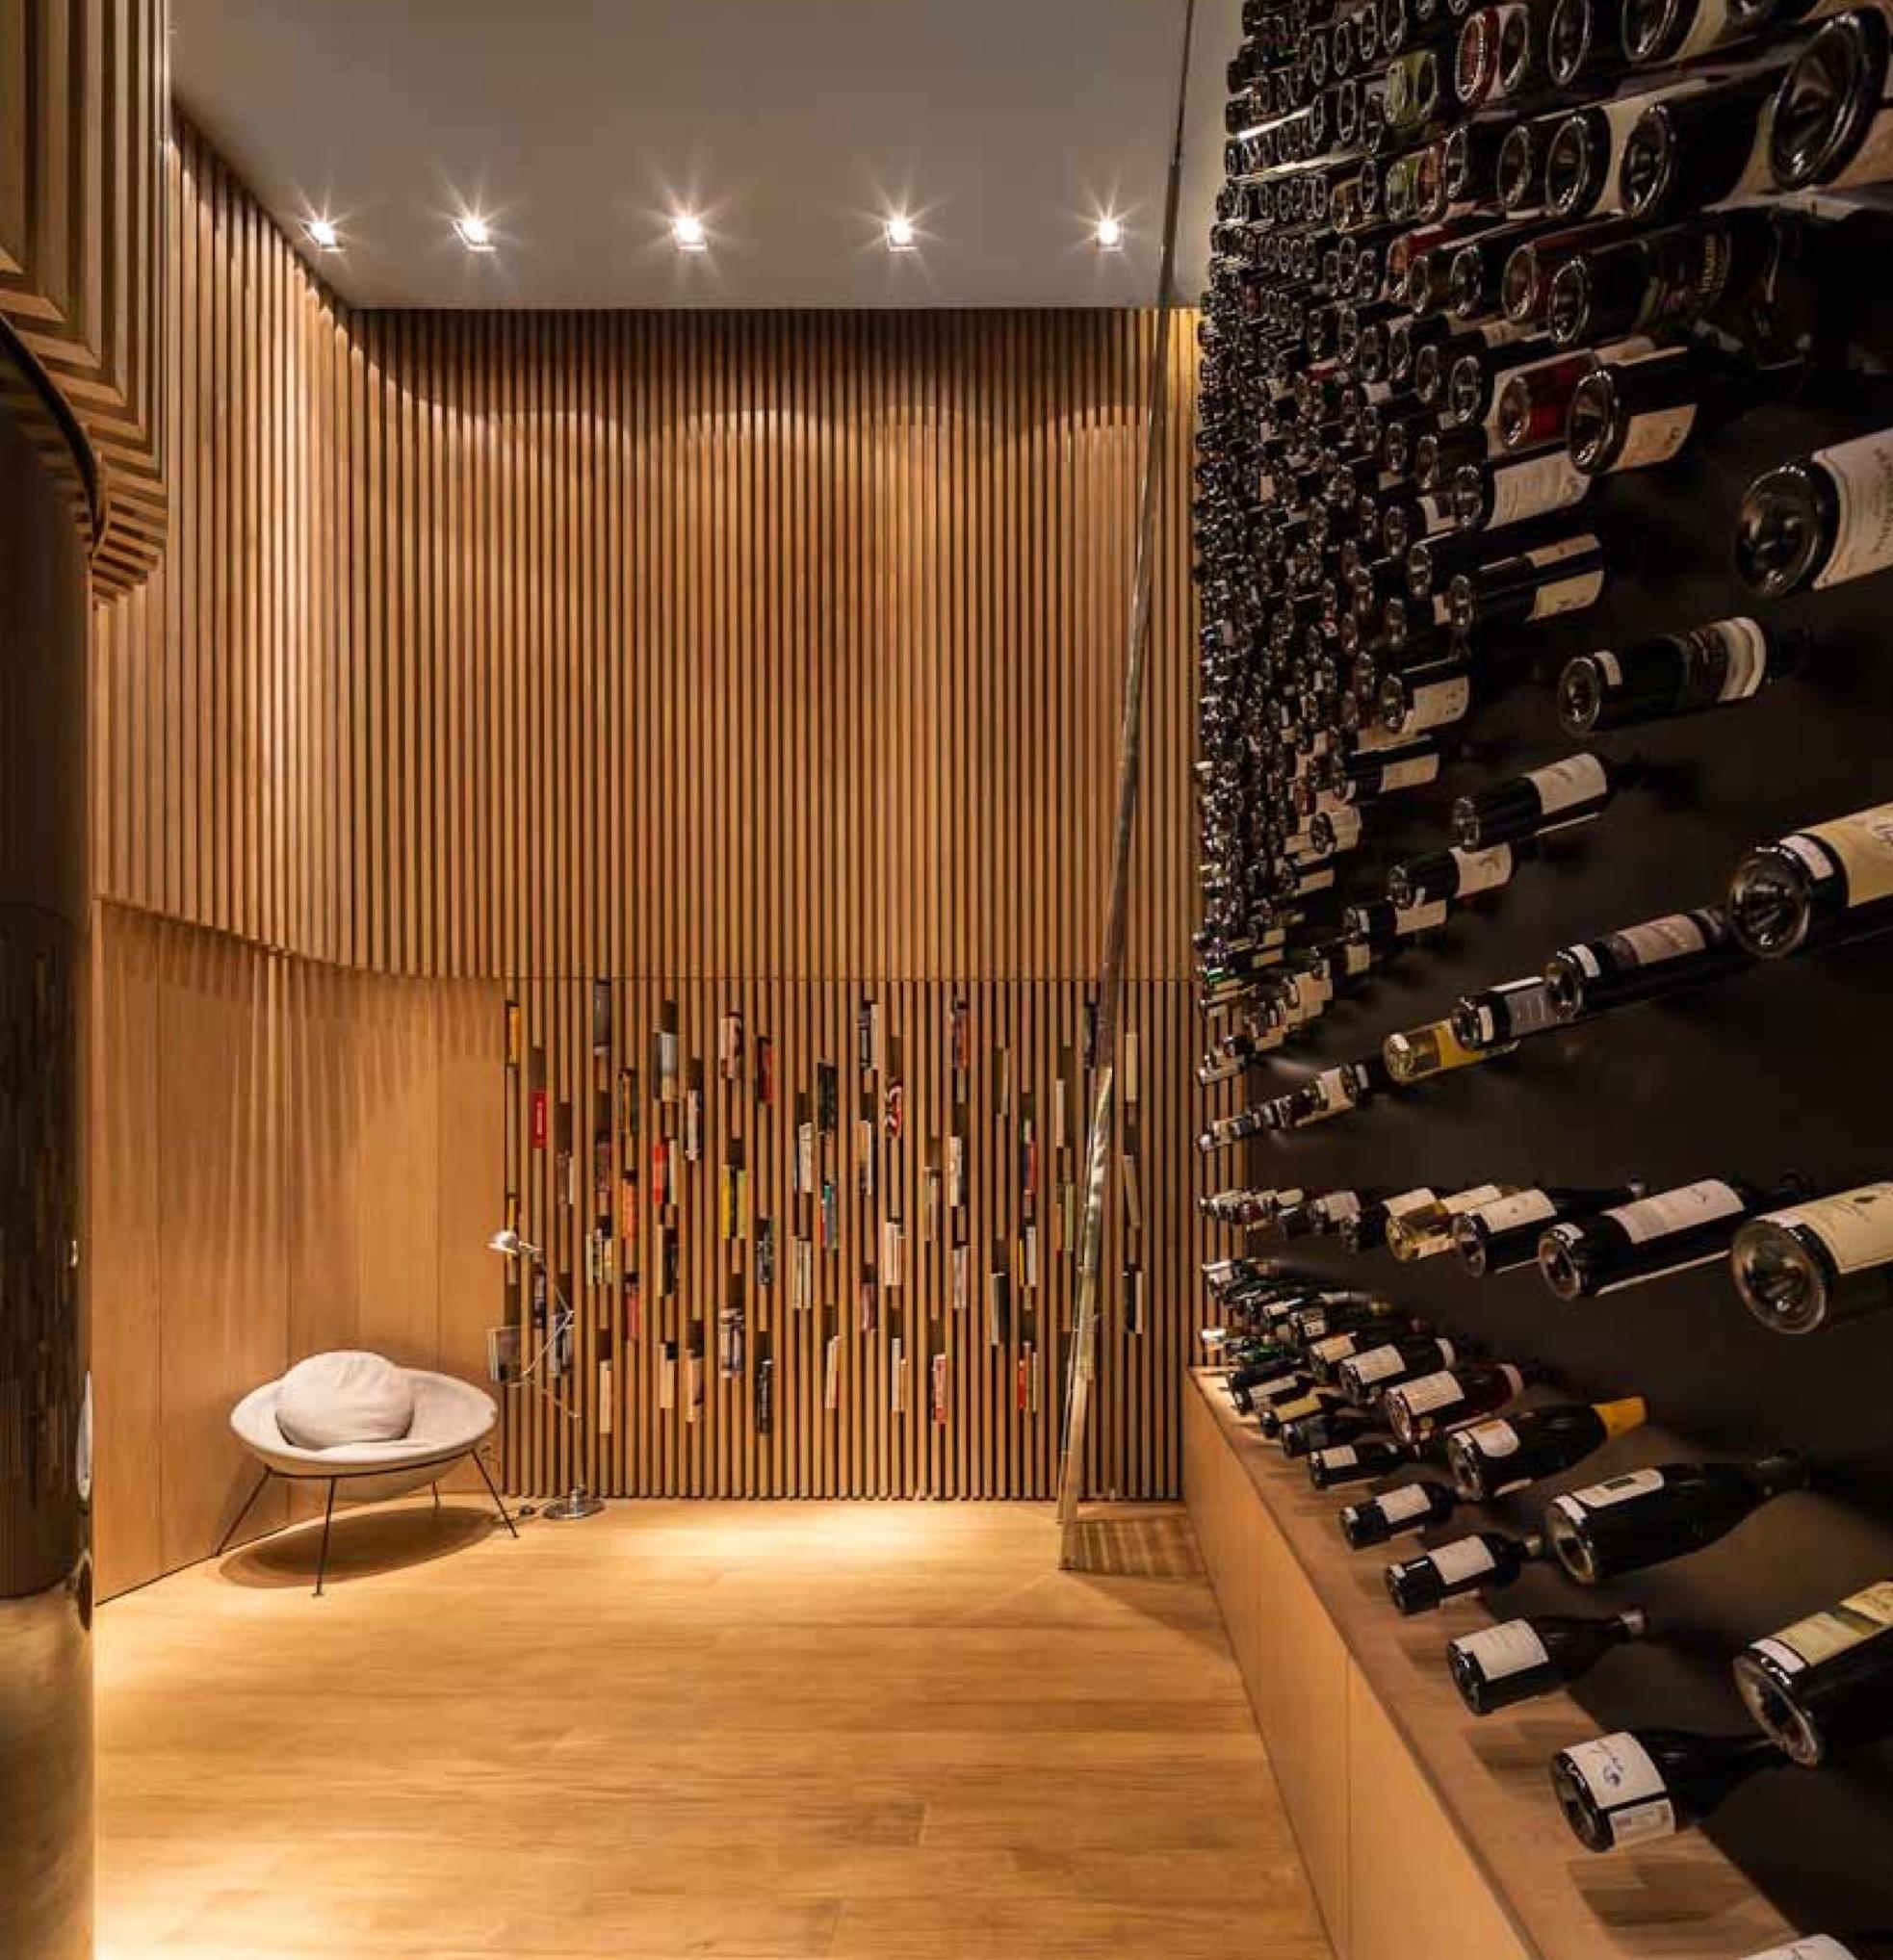 Gallery of mistral wine store studio arthur casas 7 for Top 10 new york interior designers